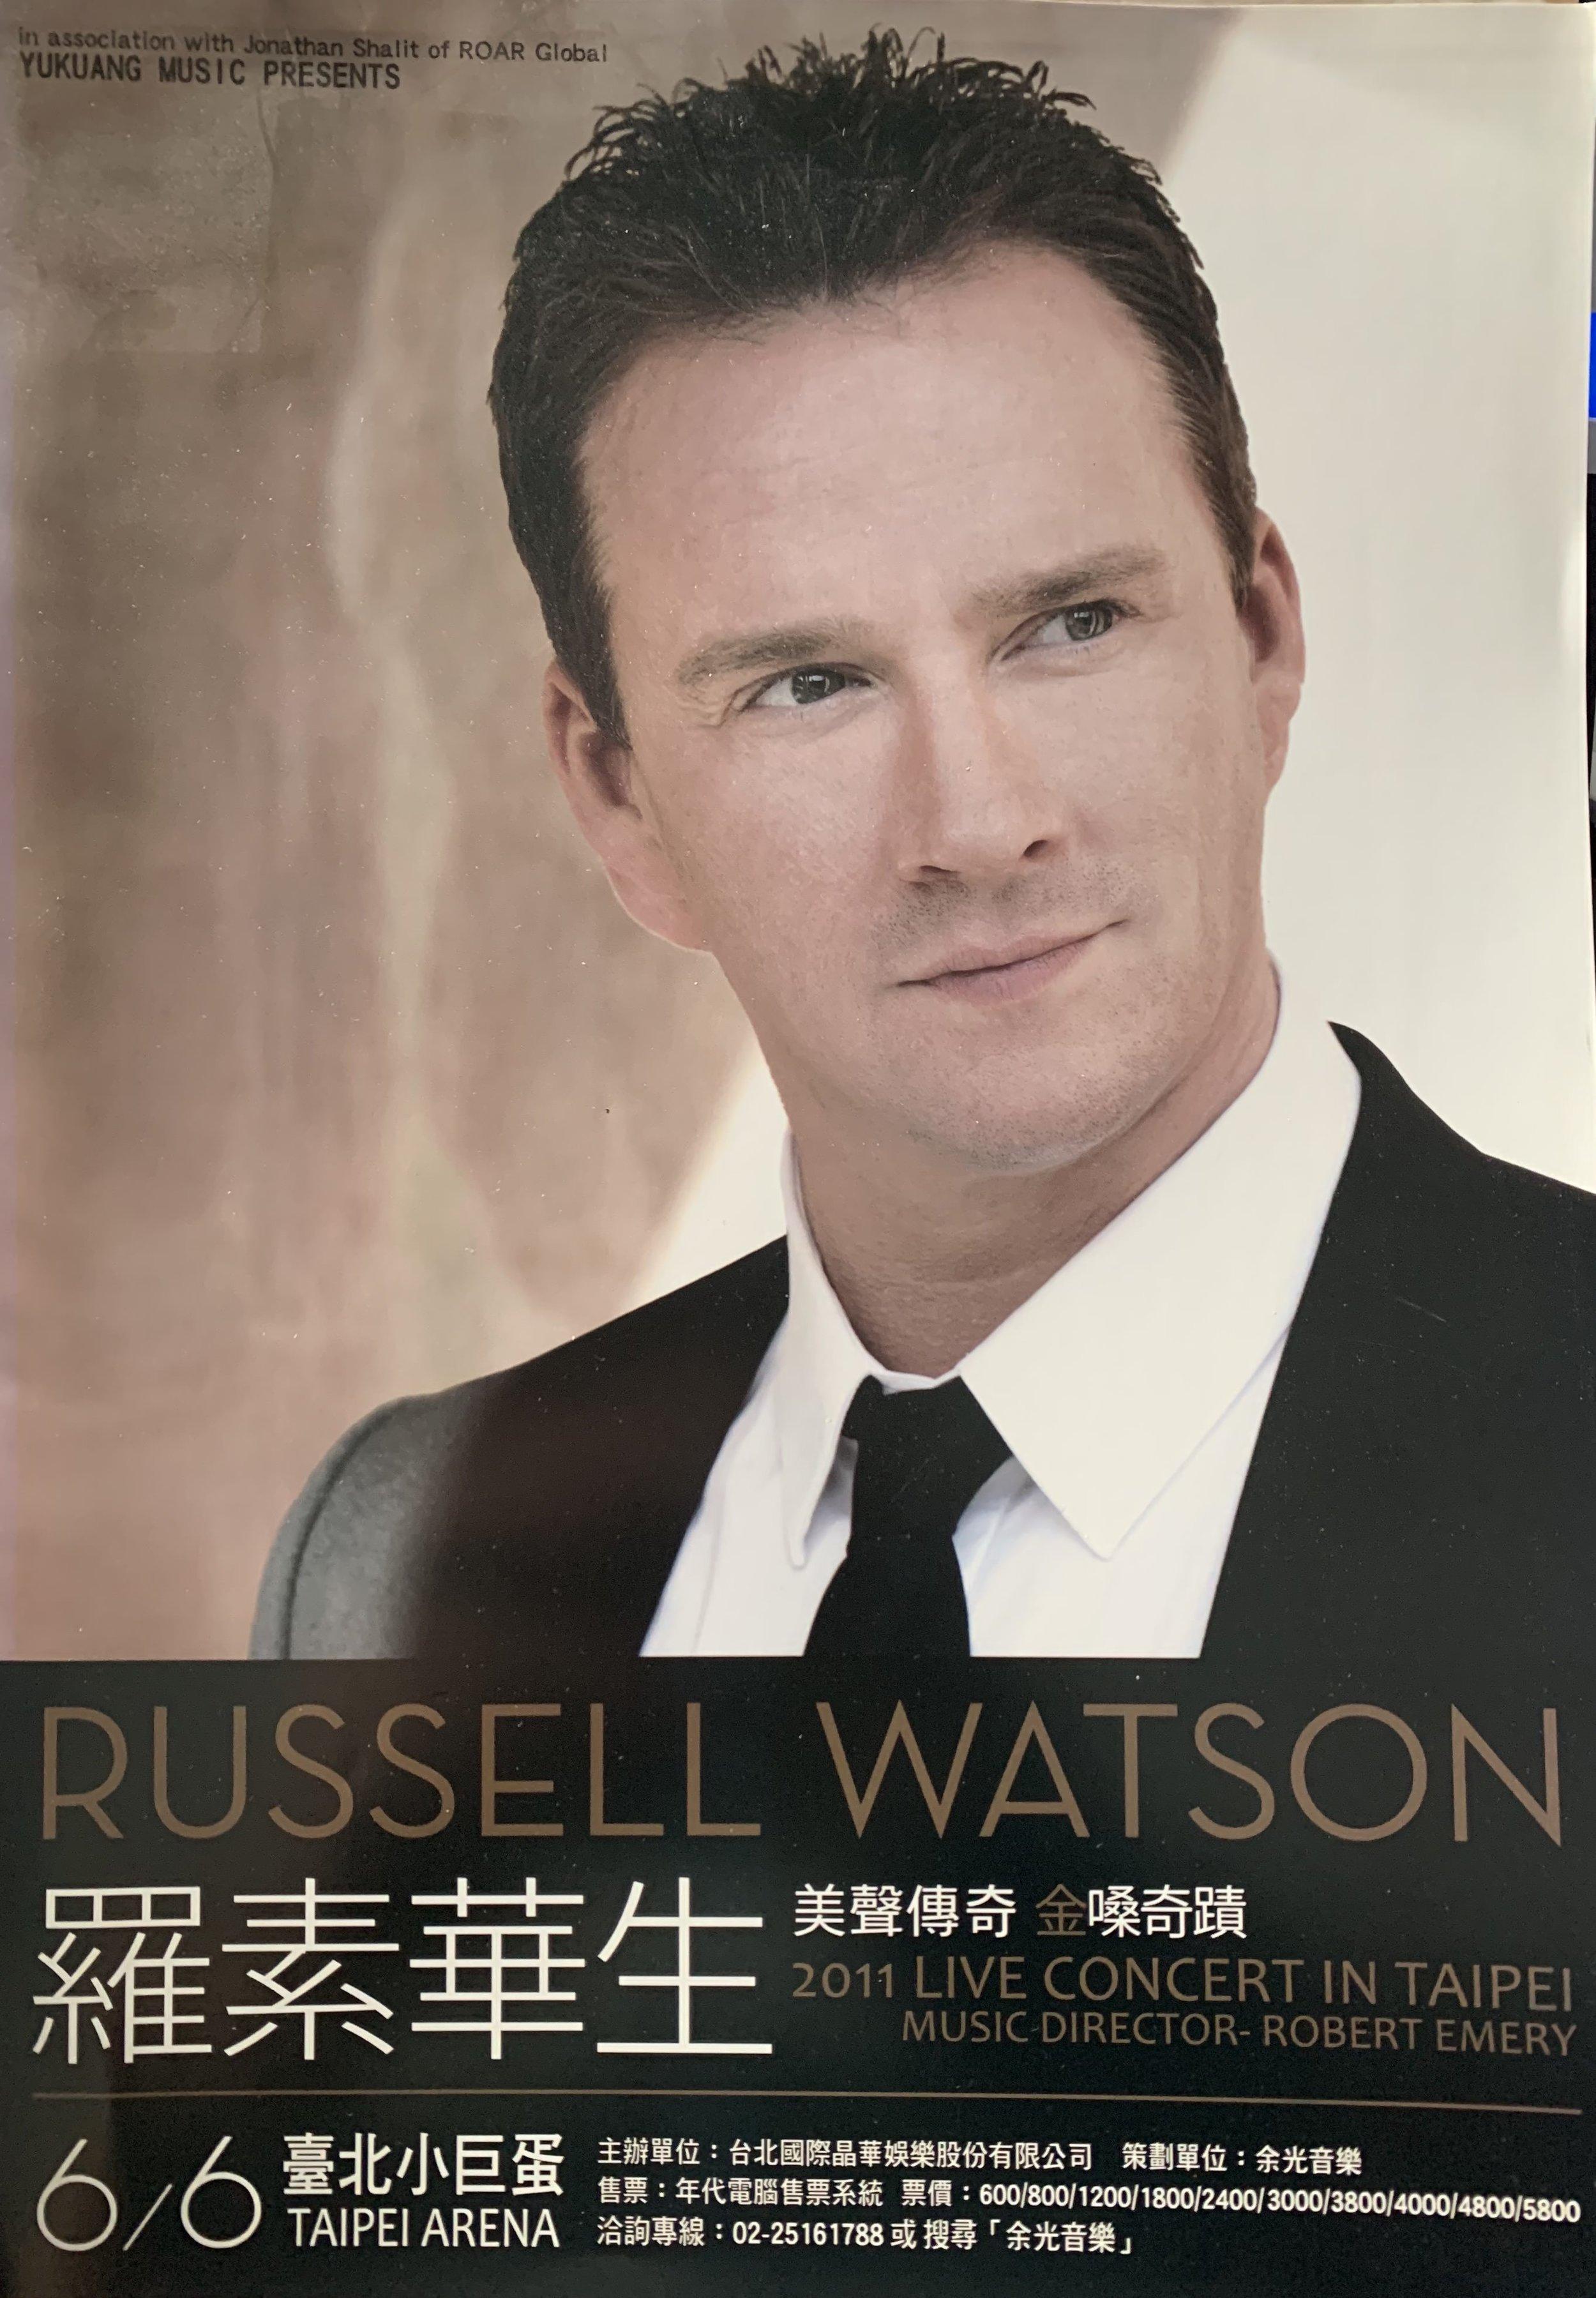 Russell Watson Robert Emery Taipei